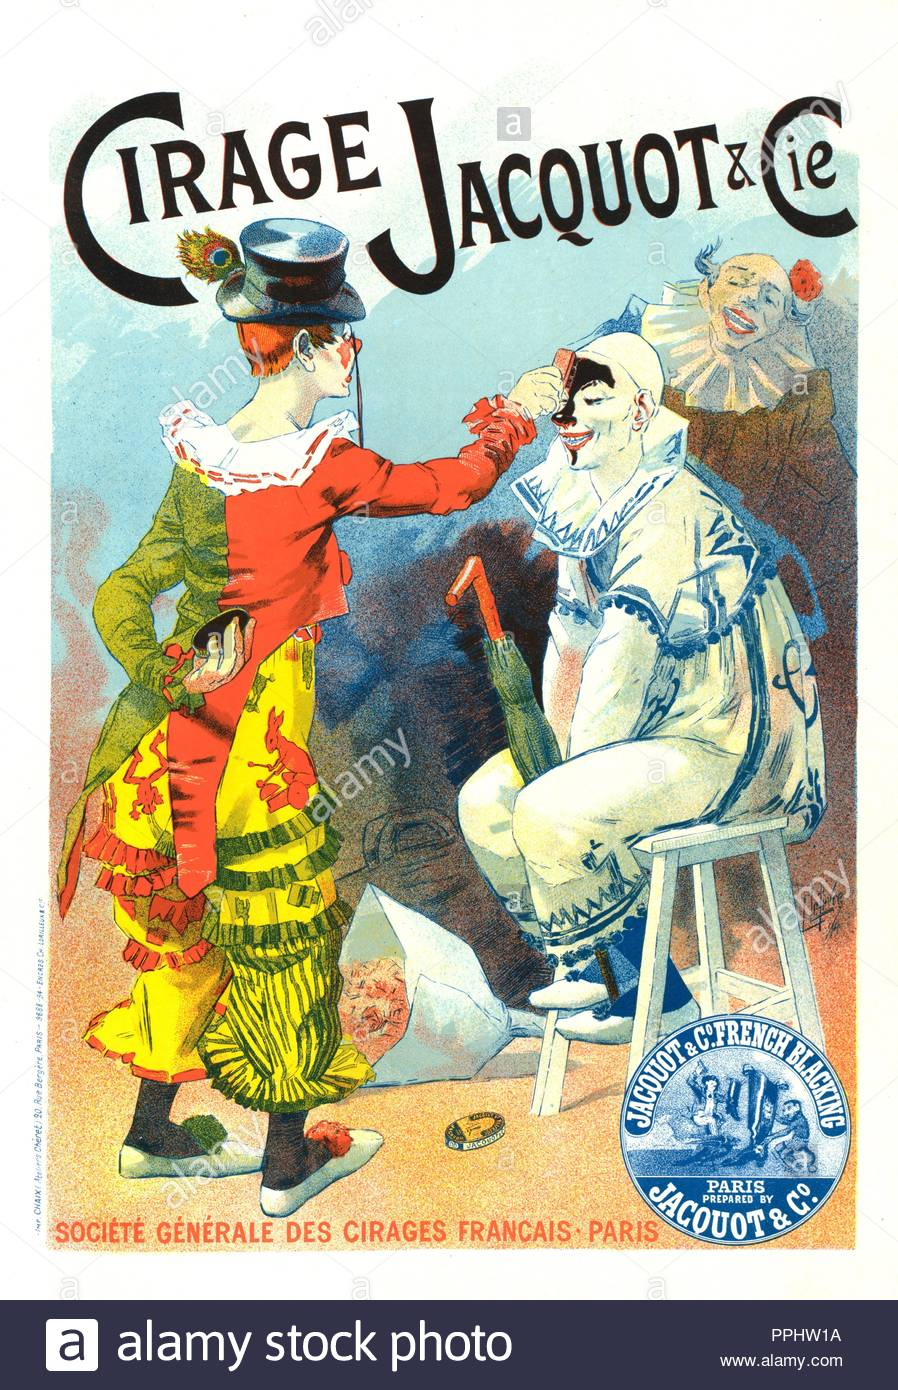 clown costume 19th century stock photos clown costume 19th century stock images alamy. Black Bedroom Furniture Sets. Home Design Ideas